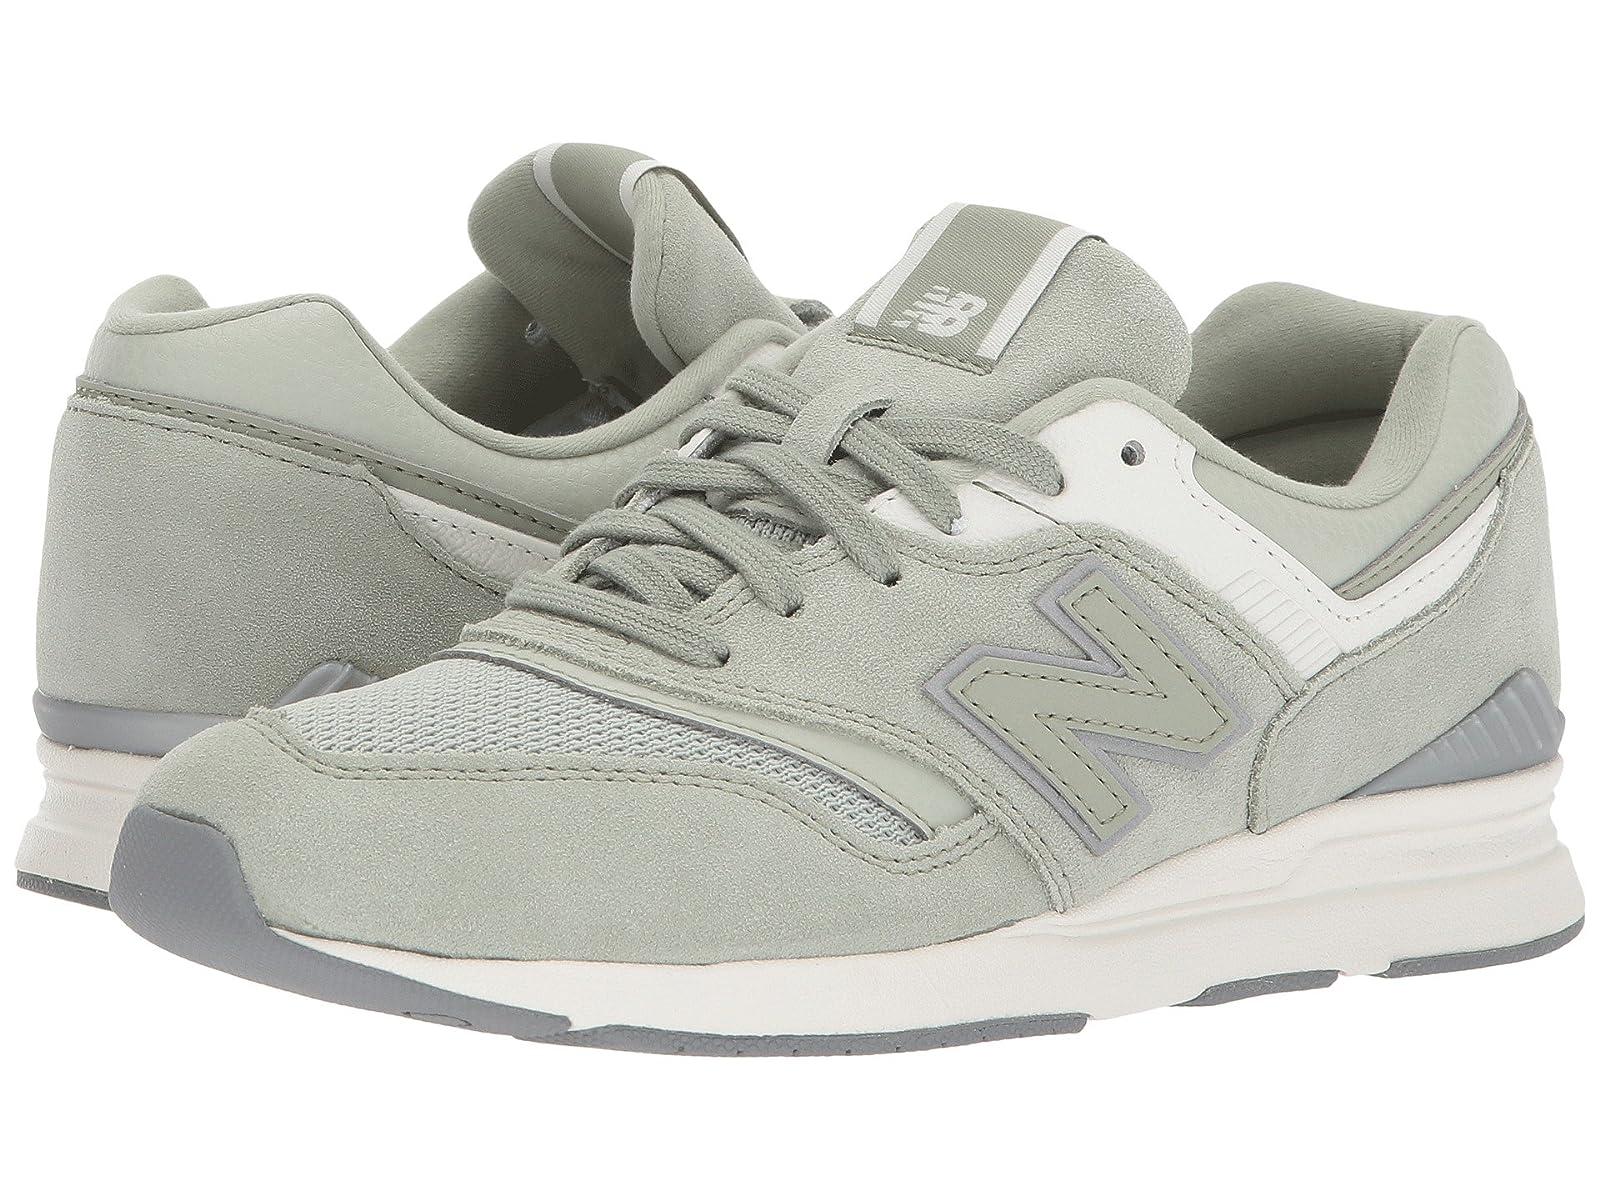 New Balance Classics WL697v1Cheap and distinctive eye-catching shoes